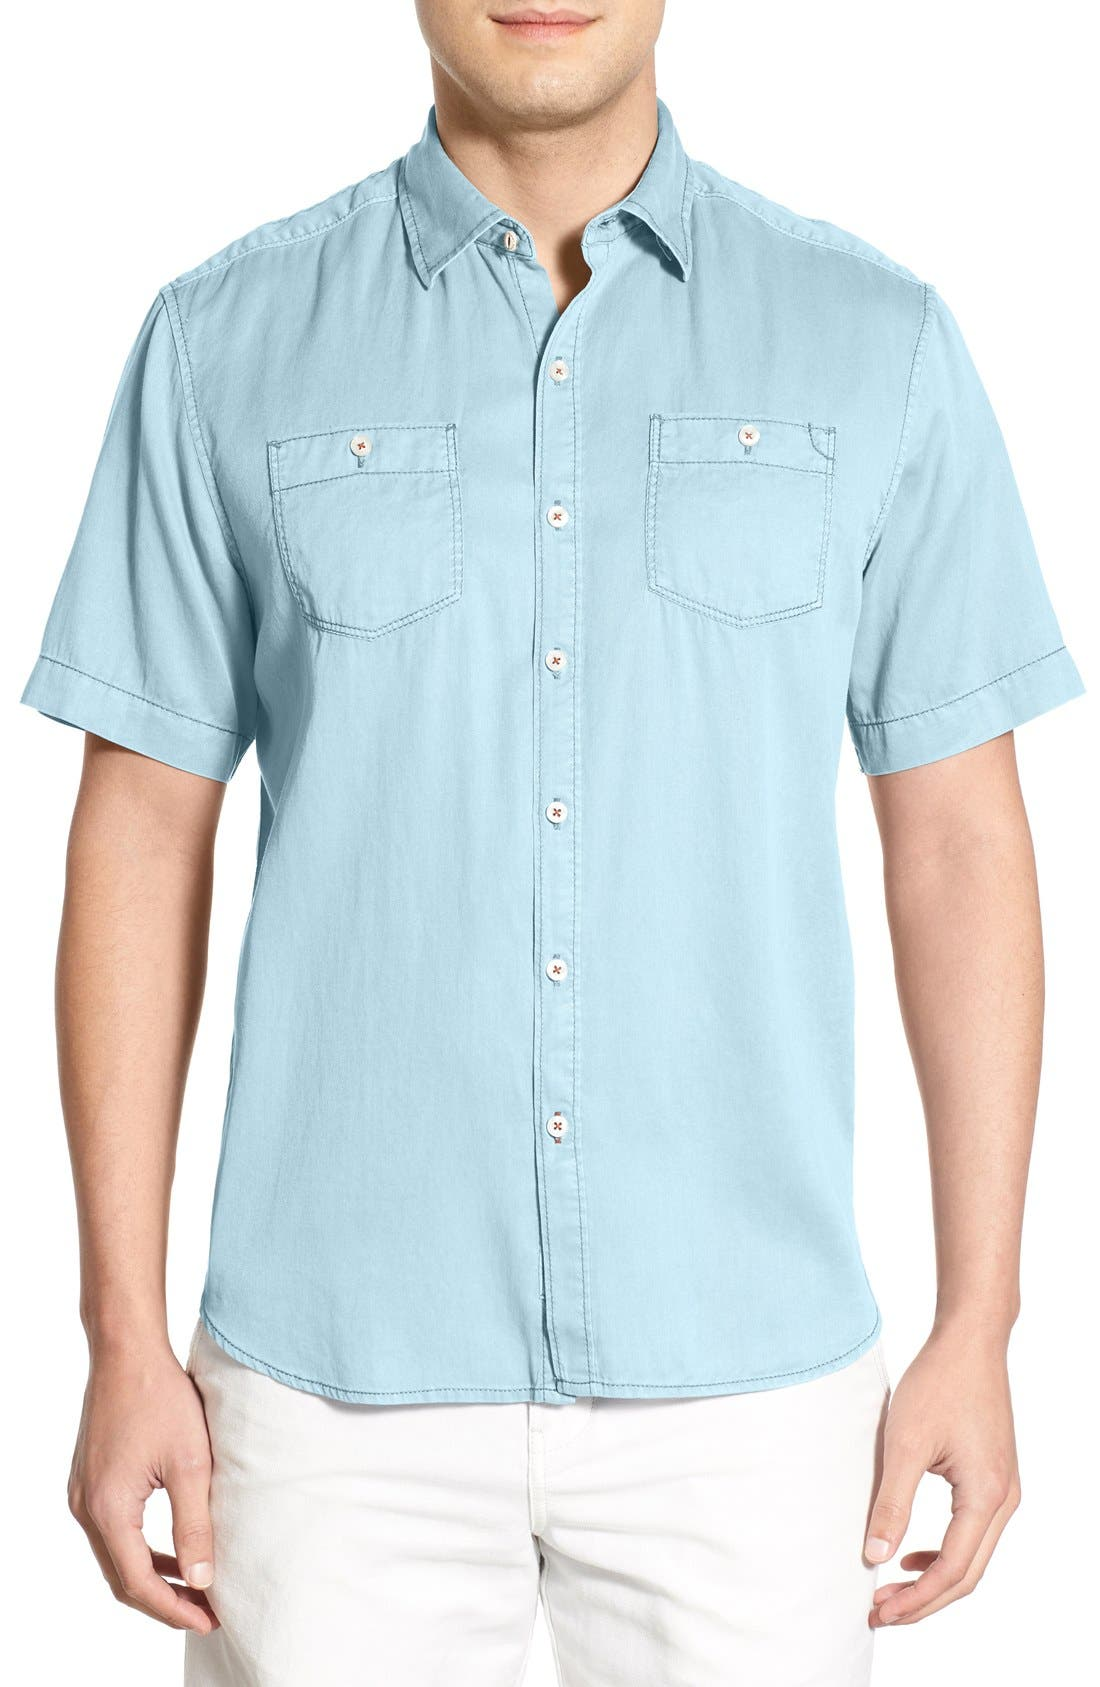 Main Image - Tommy Bahama 'New Twilly' Island Modern Fit Short Sleeve Twill Shirt